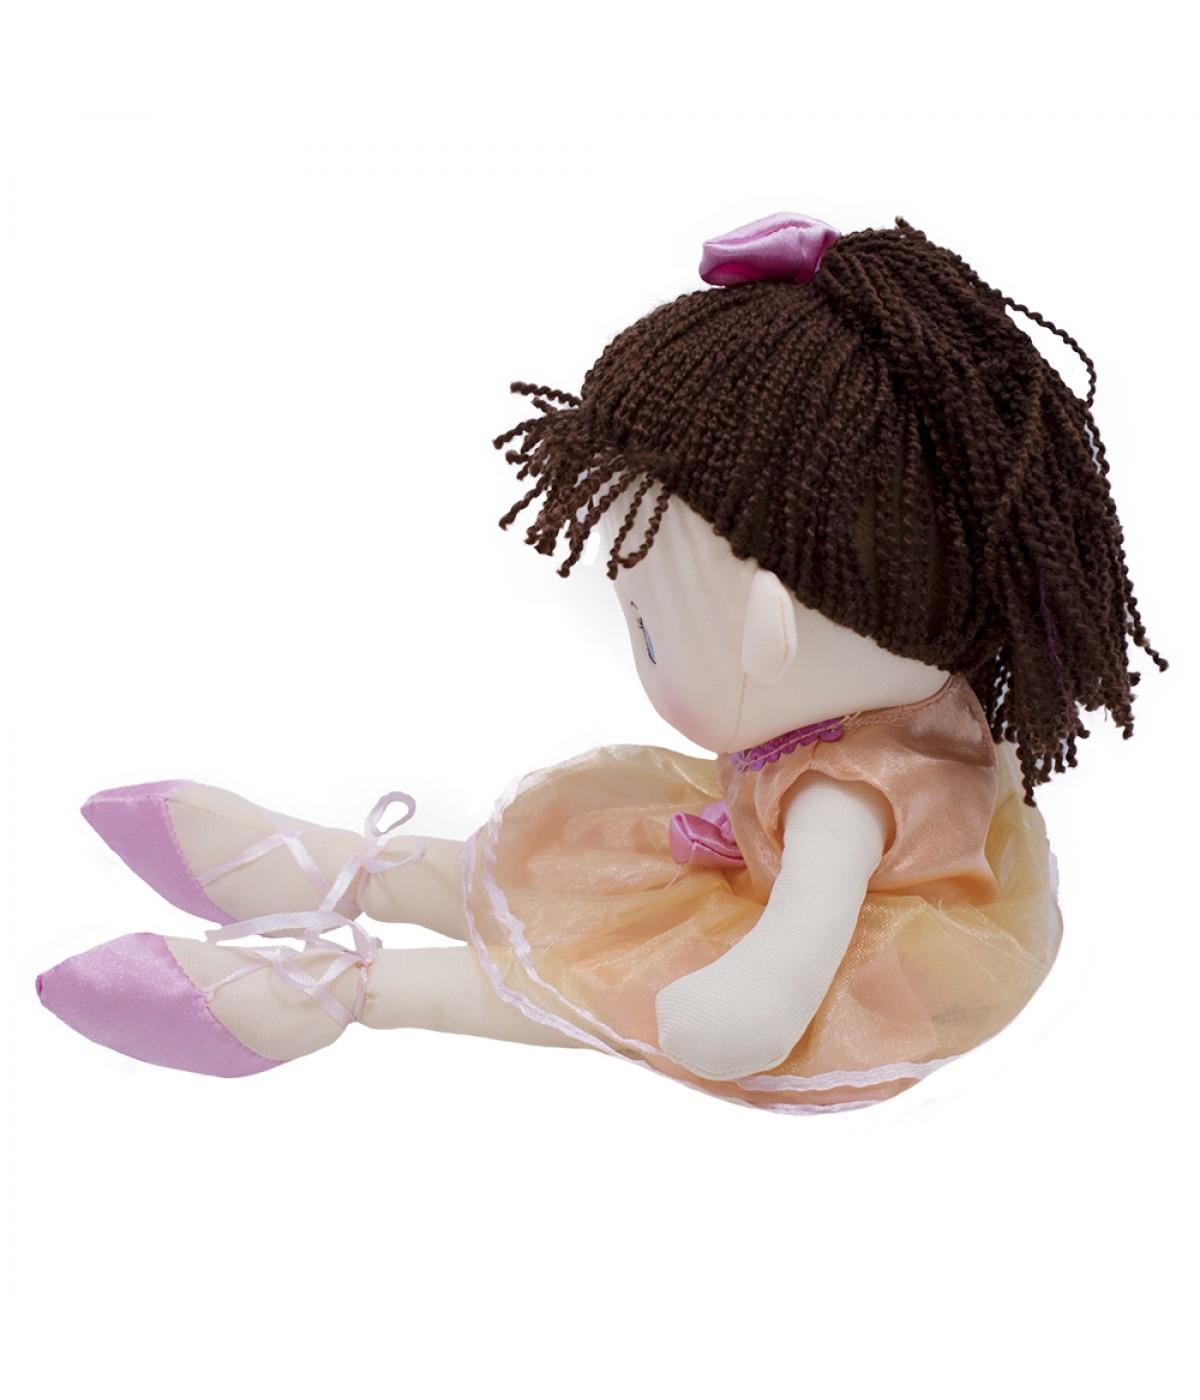 3a0c7bbe65 Boneca Bailarina Cabelo Ponytail Marrom Escuro 35cm